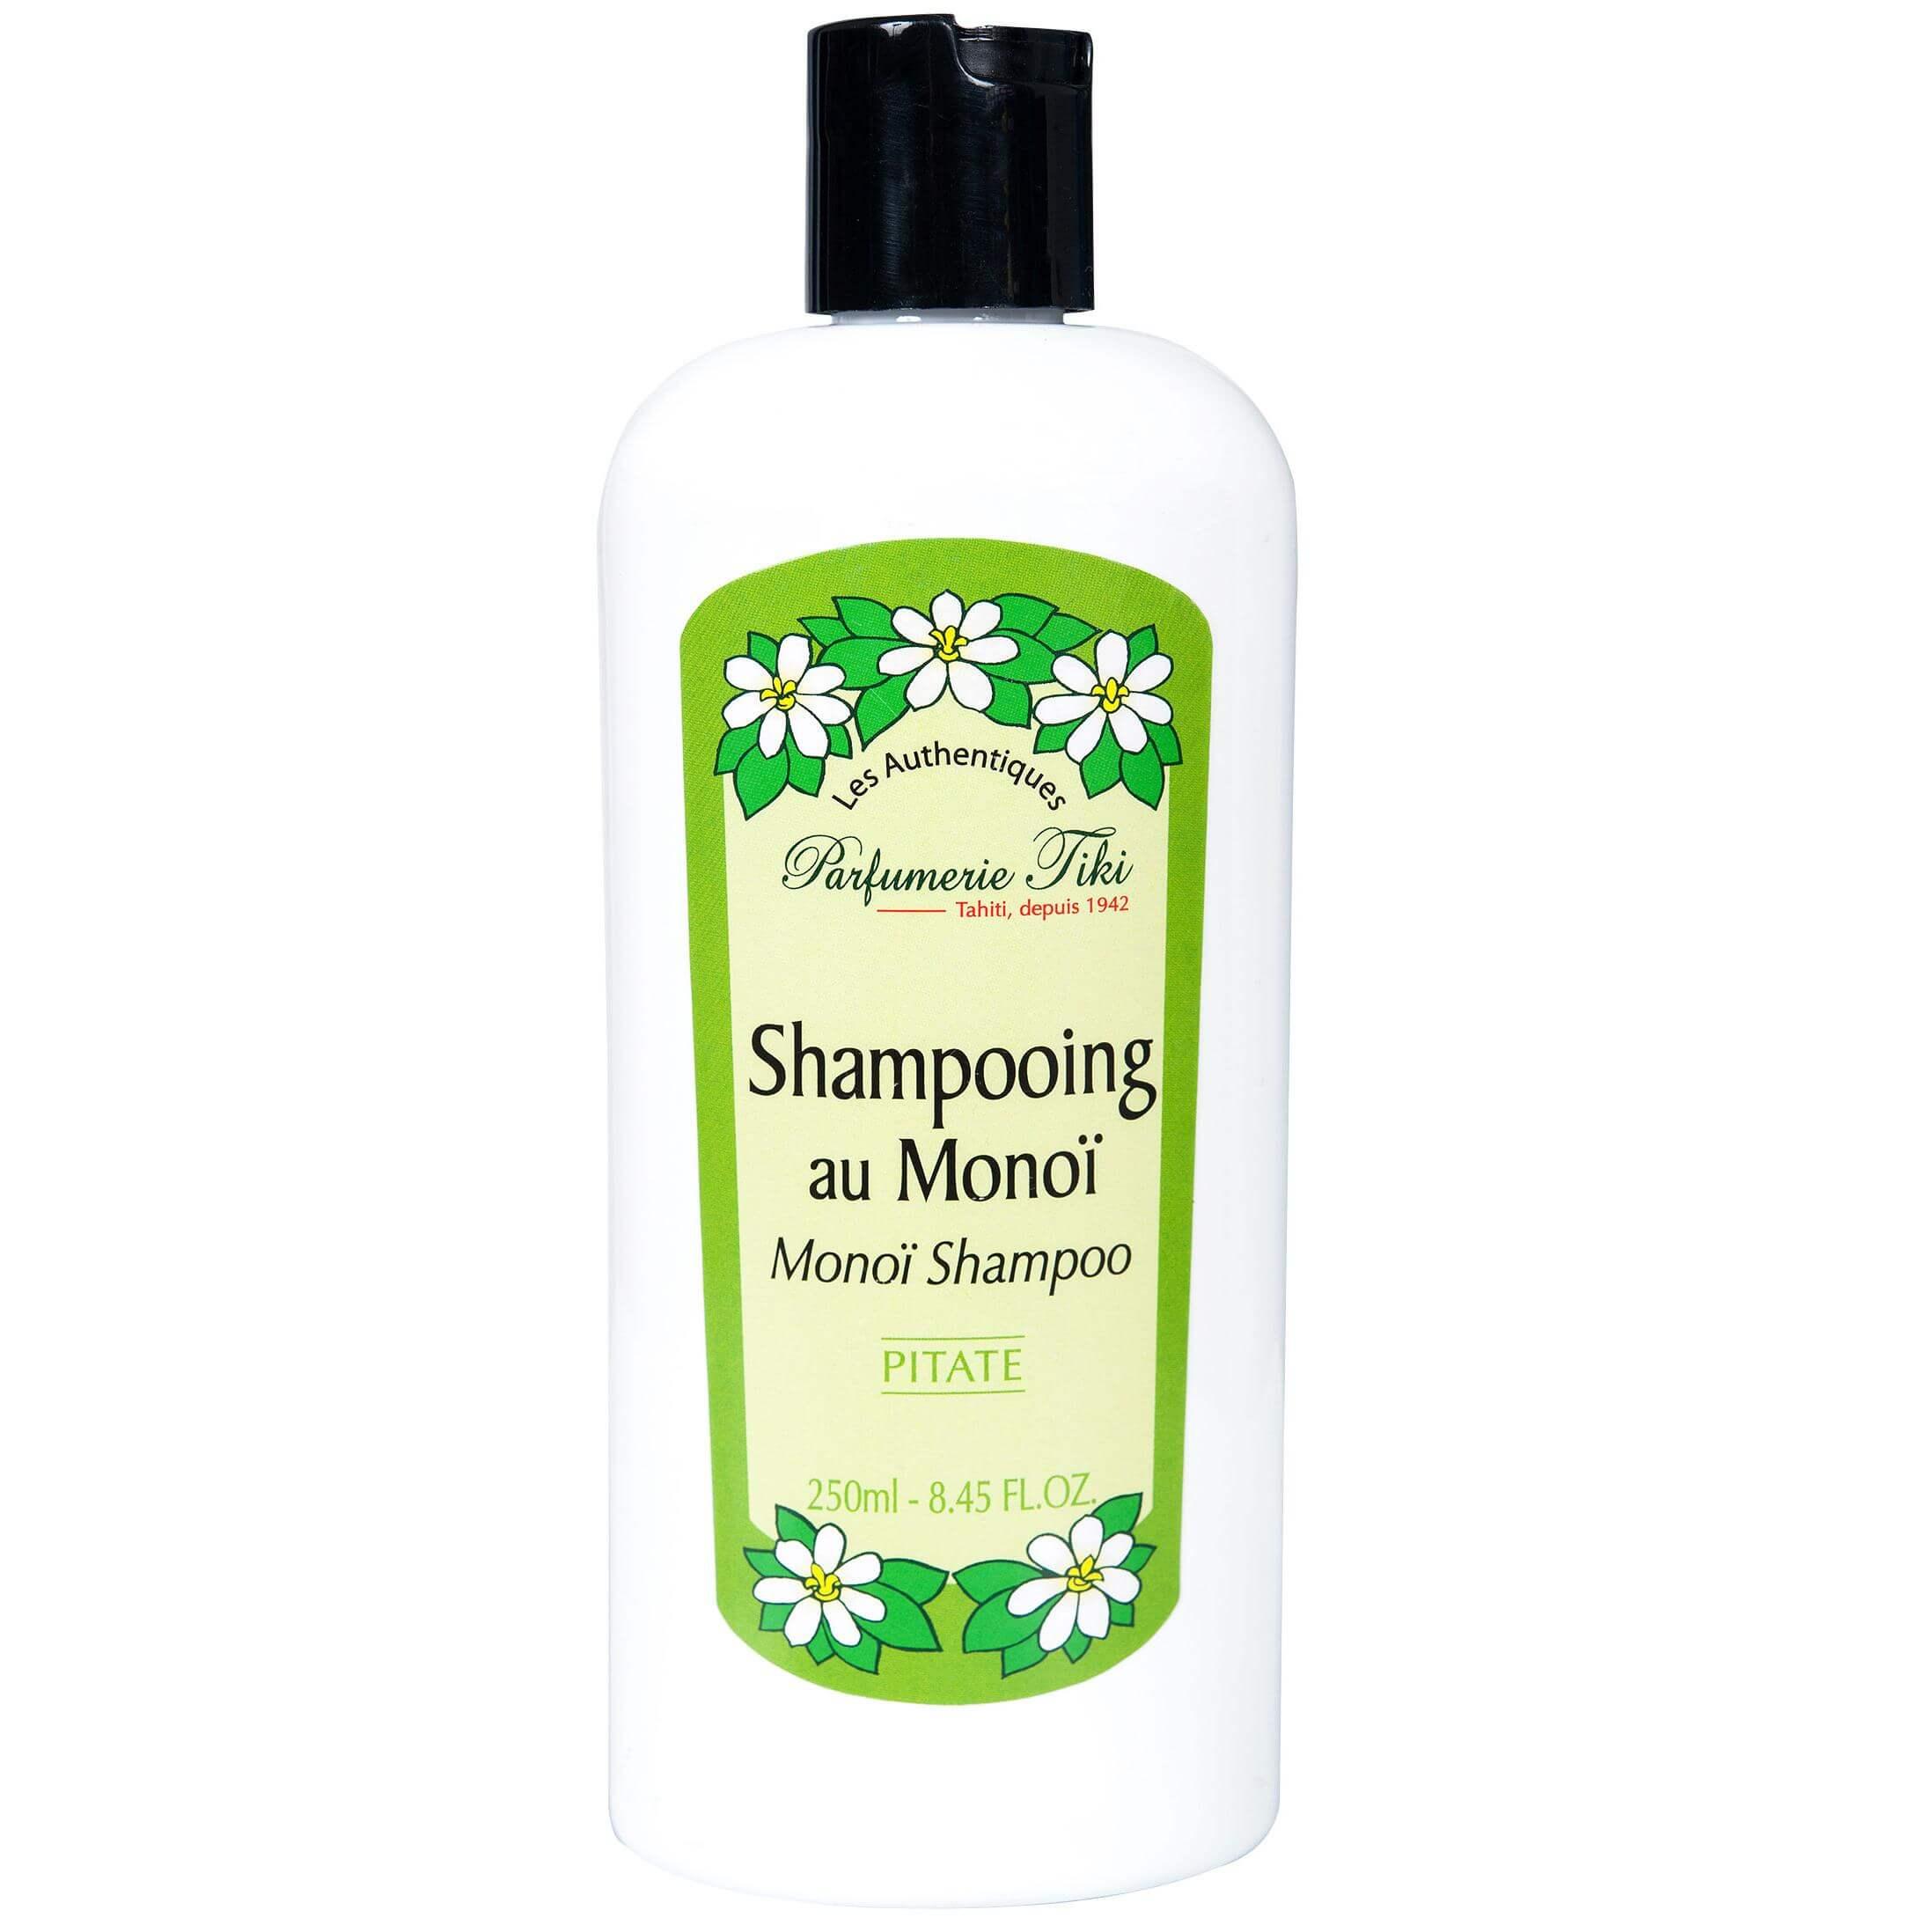 Monoi Tiki Au Monoi Pitate Σαμπουάν για Ξηρά/Κατεστραμμένα Μαλλιά με Άρωμα Γιασεμιού 250ml